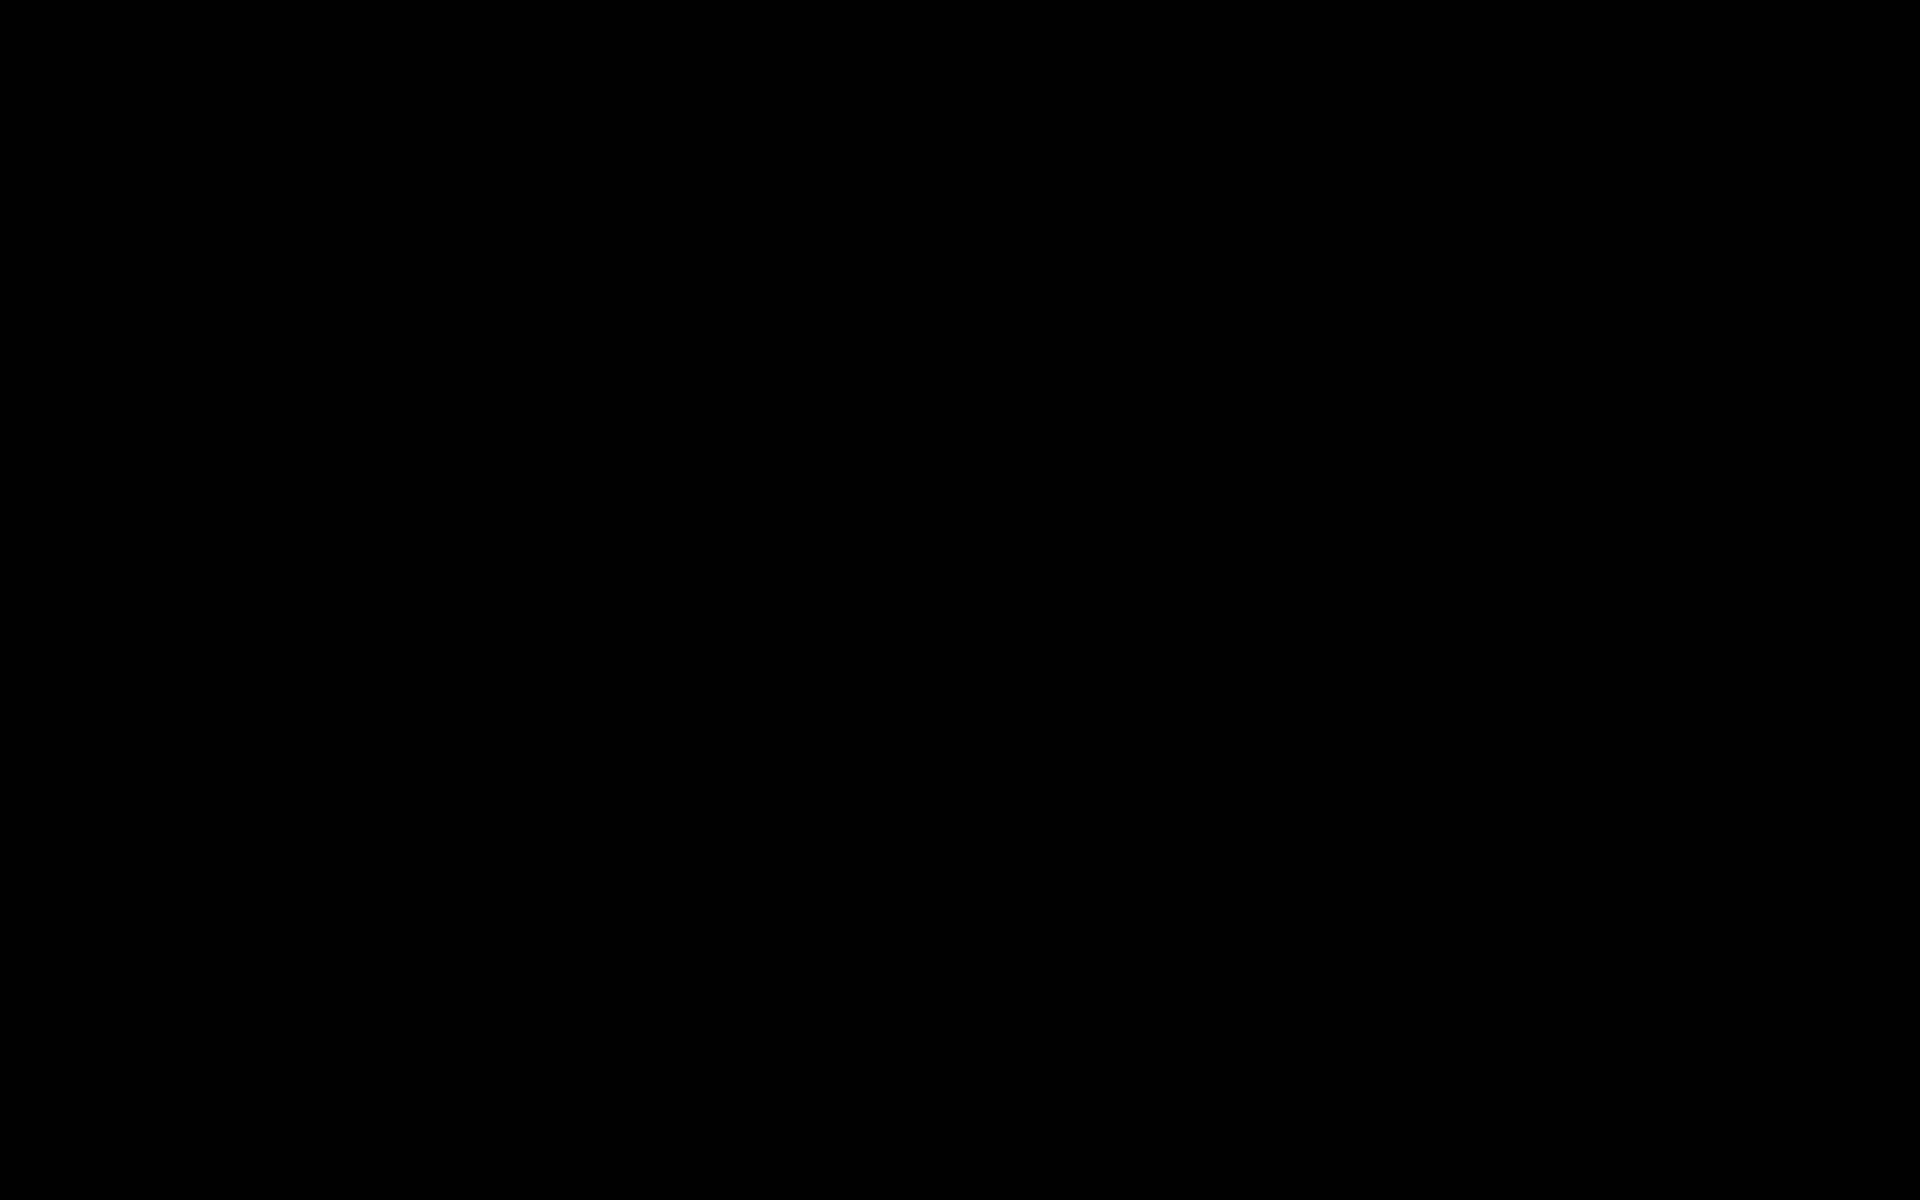 075-14112015